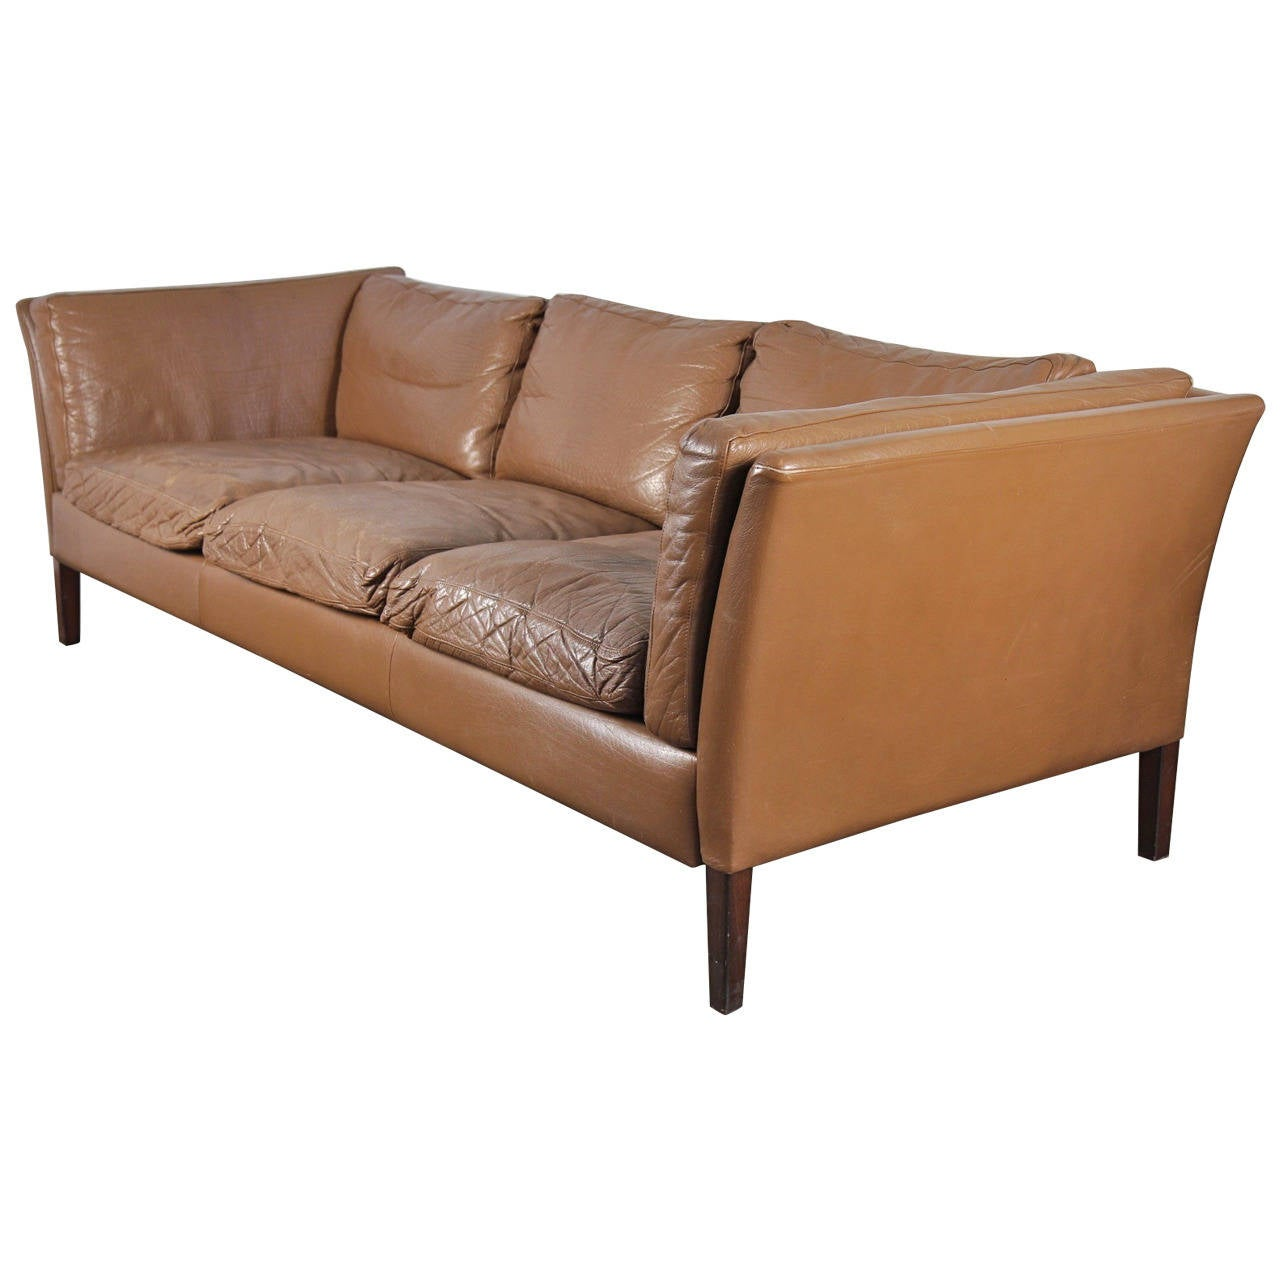 1960s Danish Modern Leather Sofa at 1stdibs